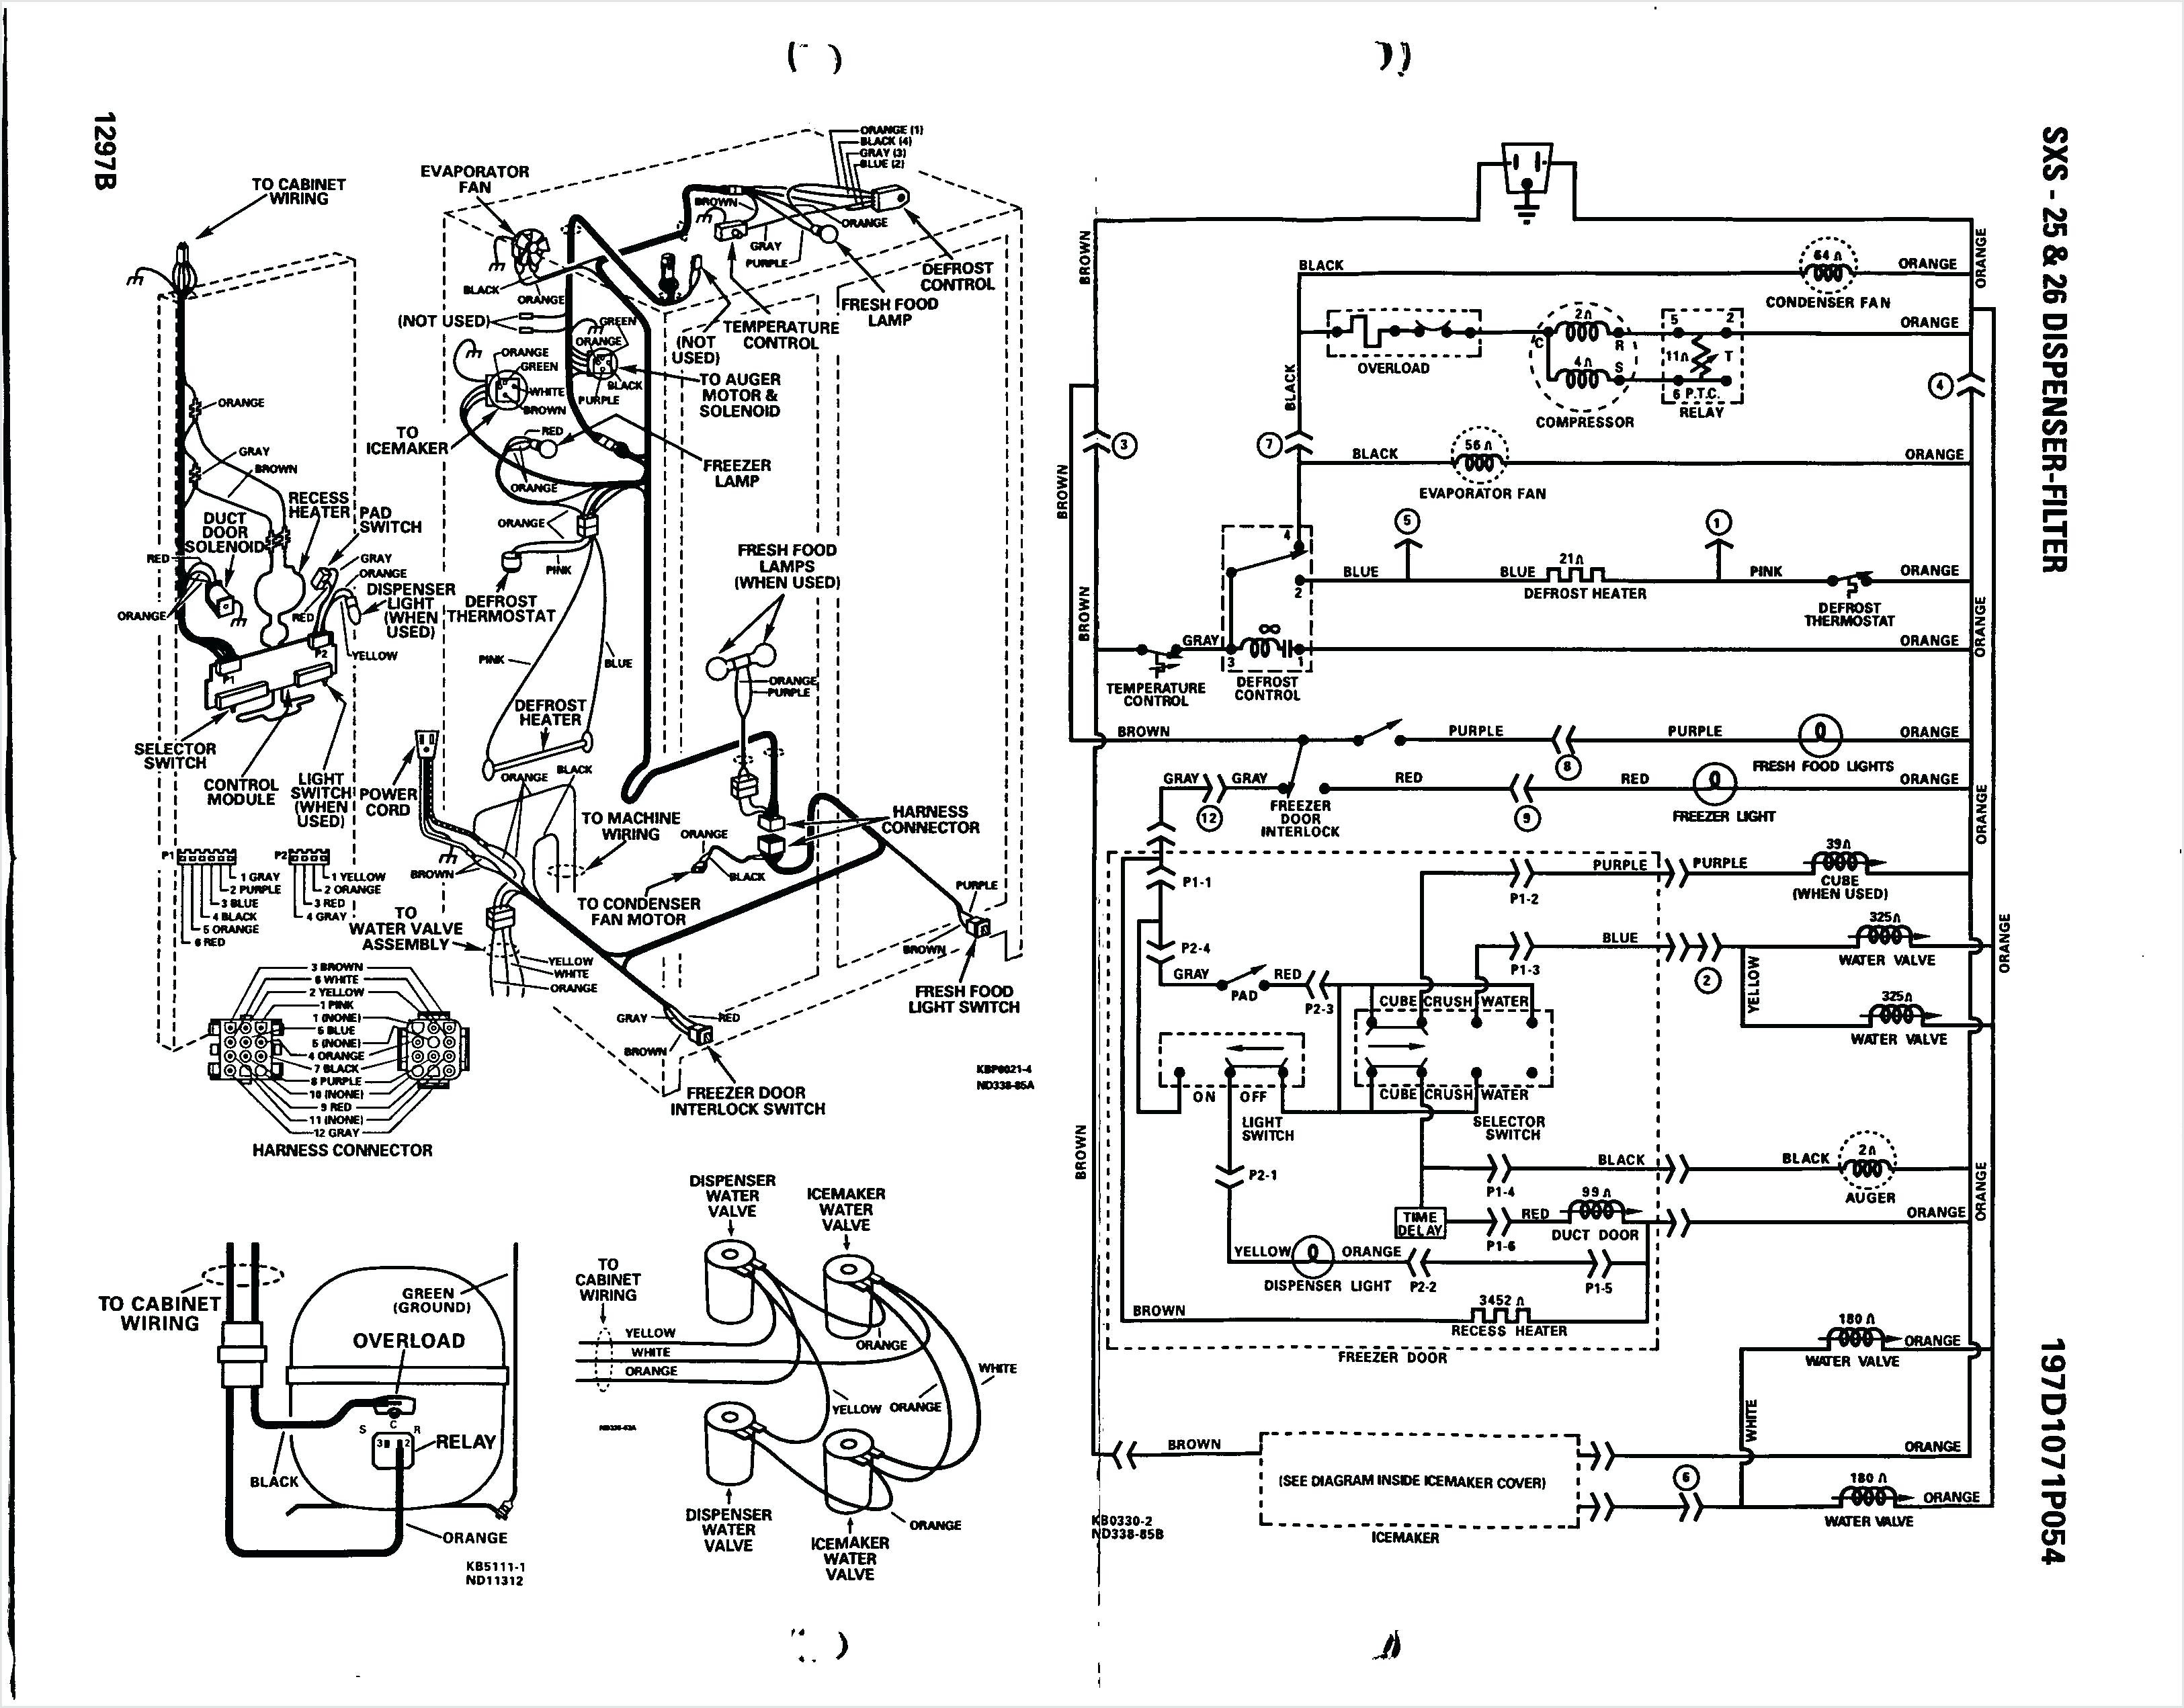 wiring diagram additionally whirlpool cabrio dryer heating element rh sellfie co